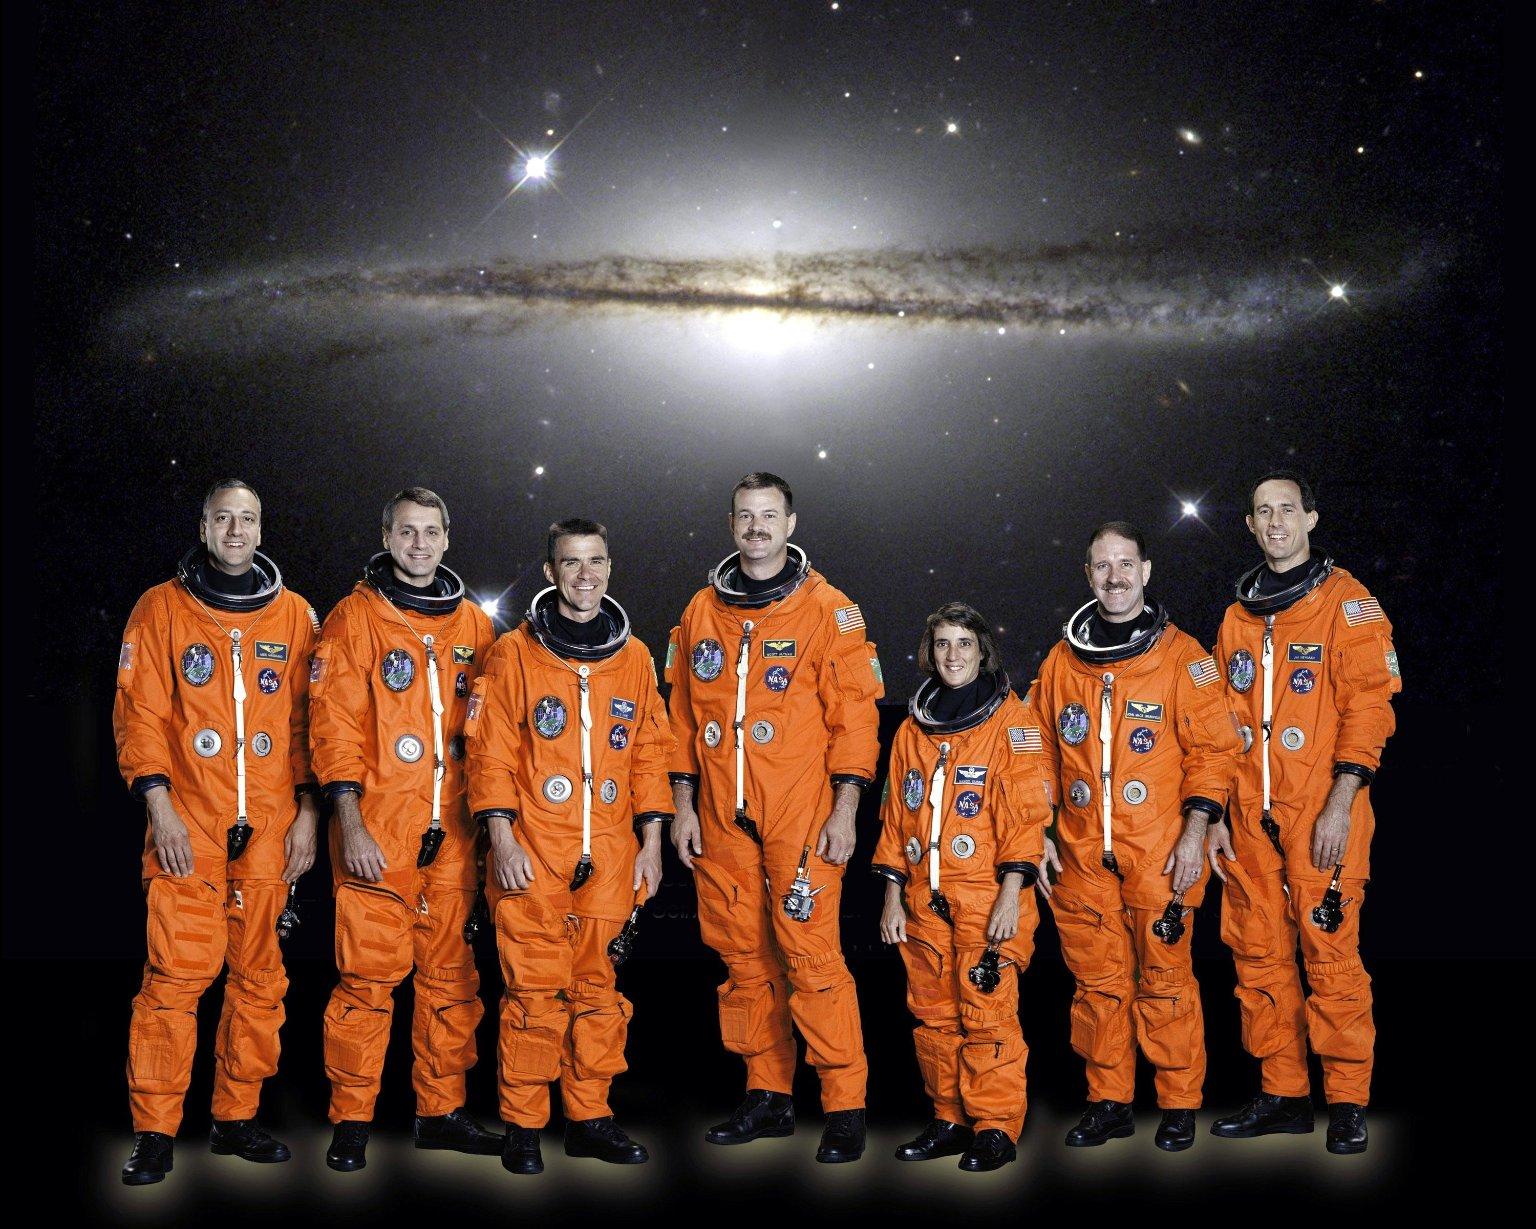 astronaut space team - photo #46